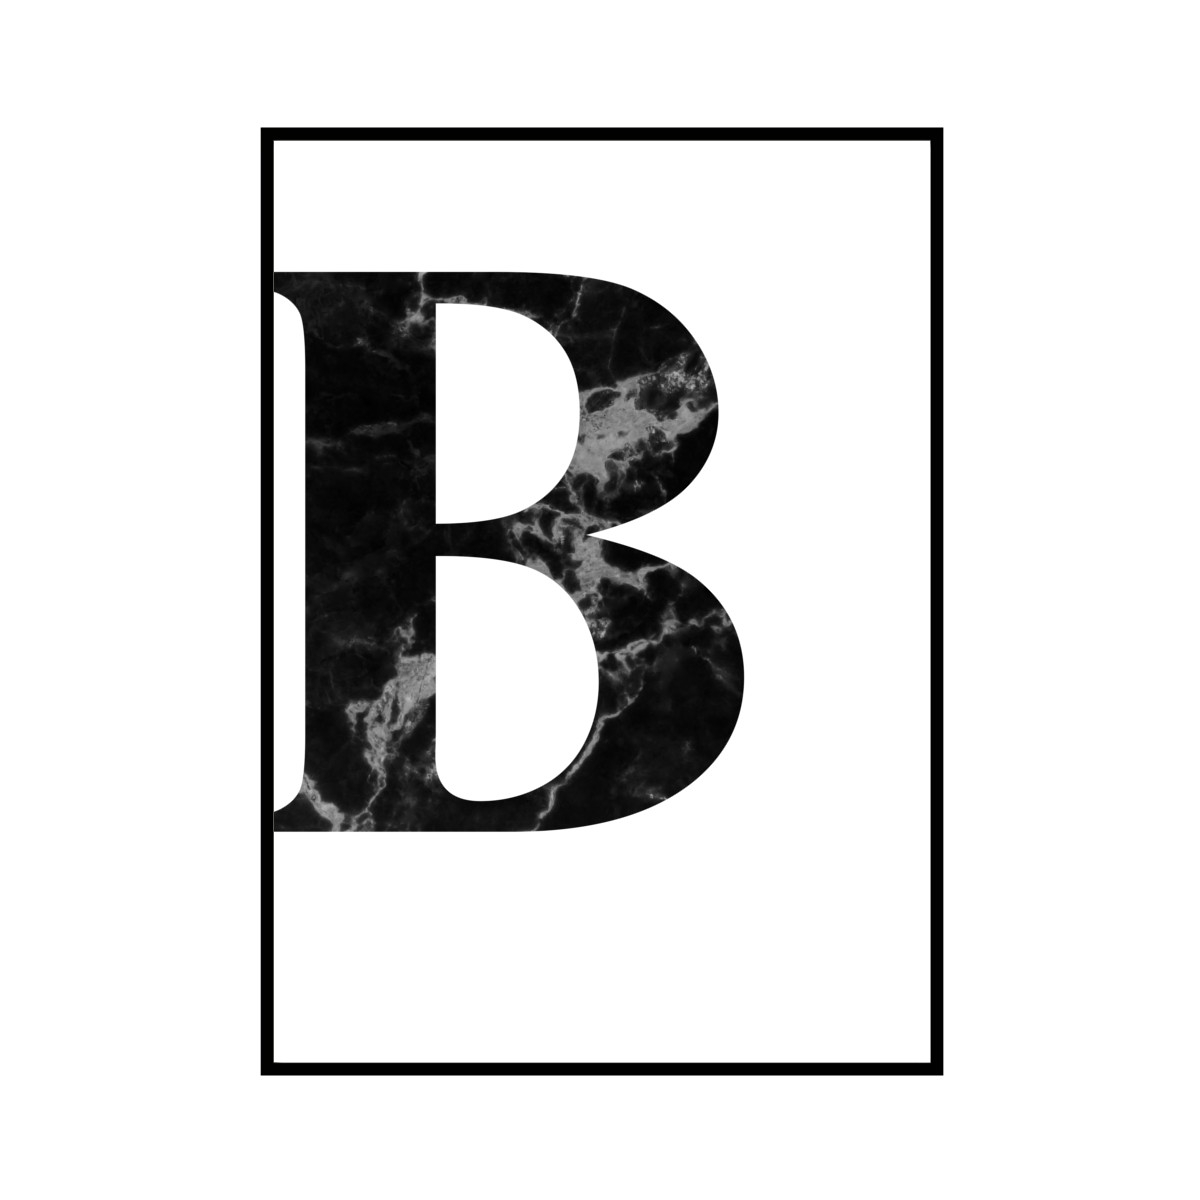 """B"" 黒大理石 - Black marble - ALPHAシリーズ [SD-000503] A1サイズ ポスター単品"